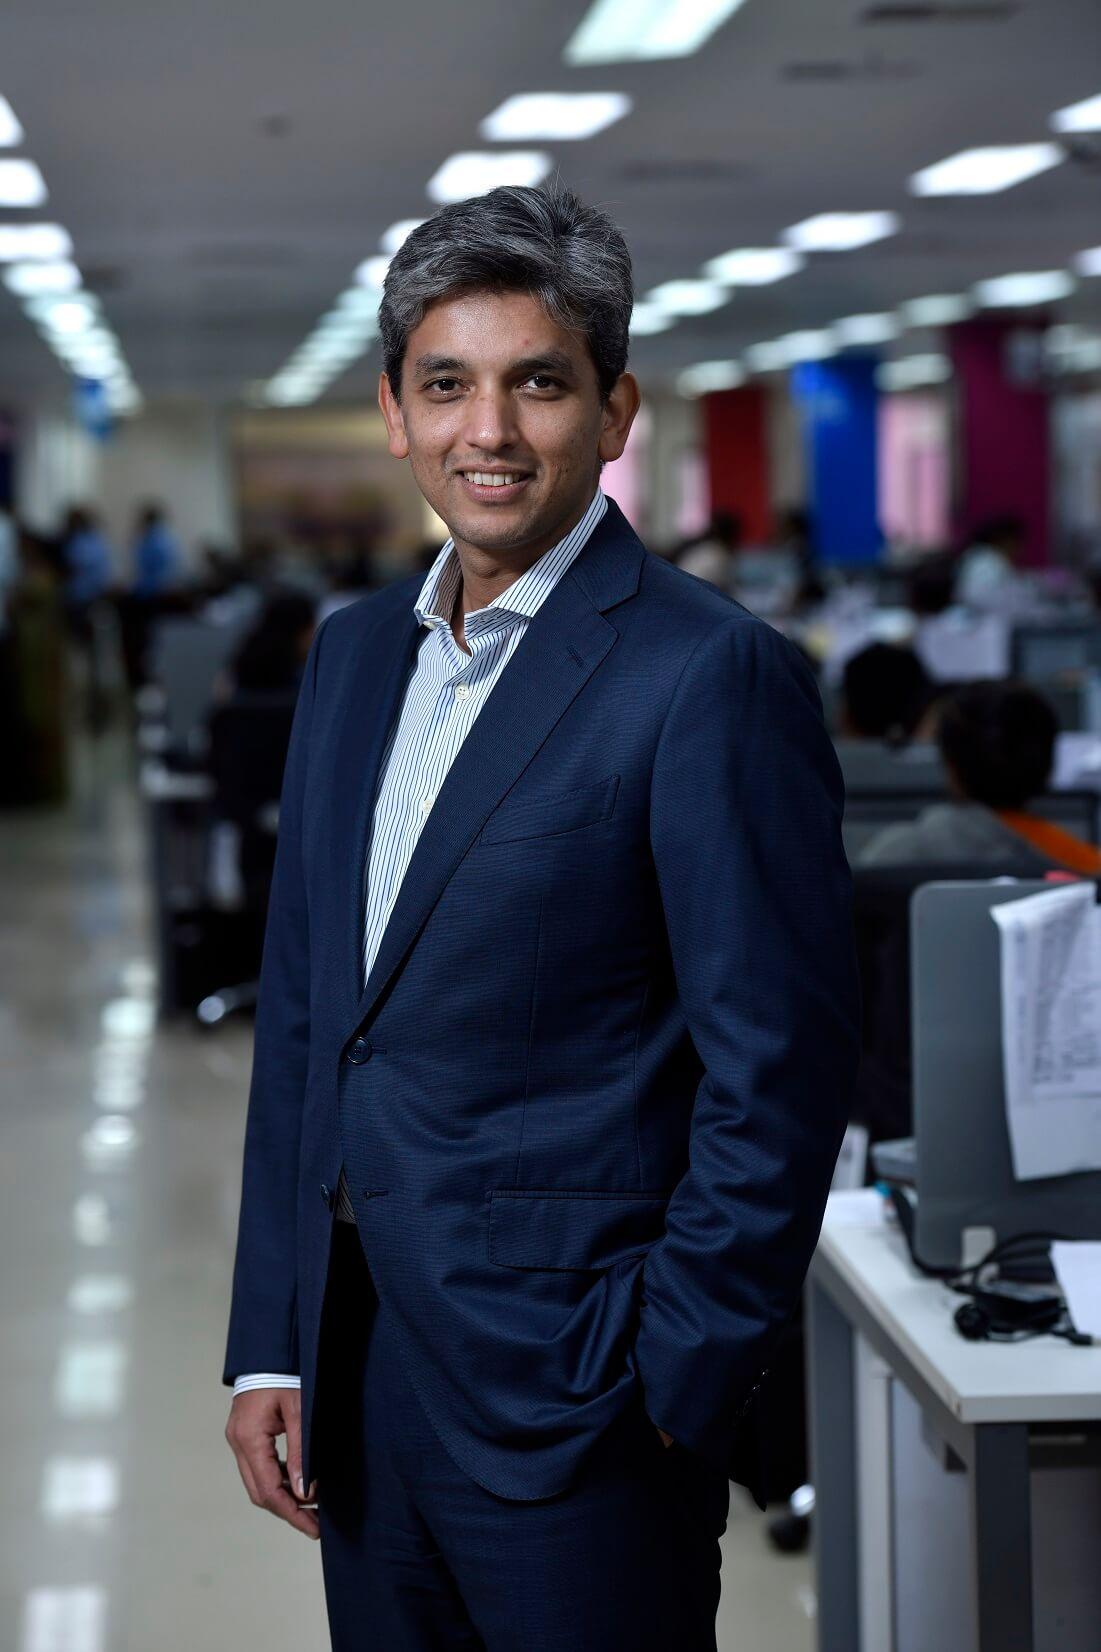 Mr.-Rakshit-Desai-Managing-Director-FCM-Travel-Solutions